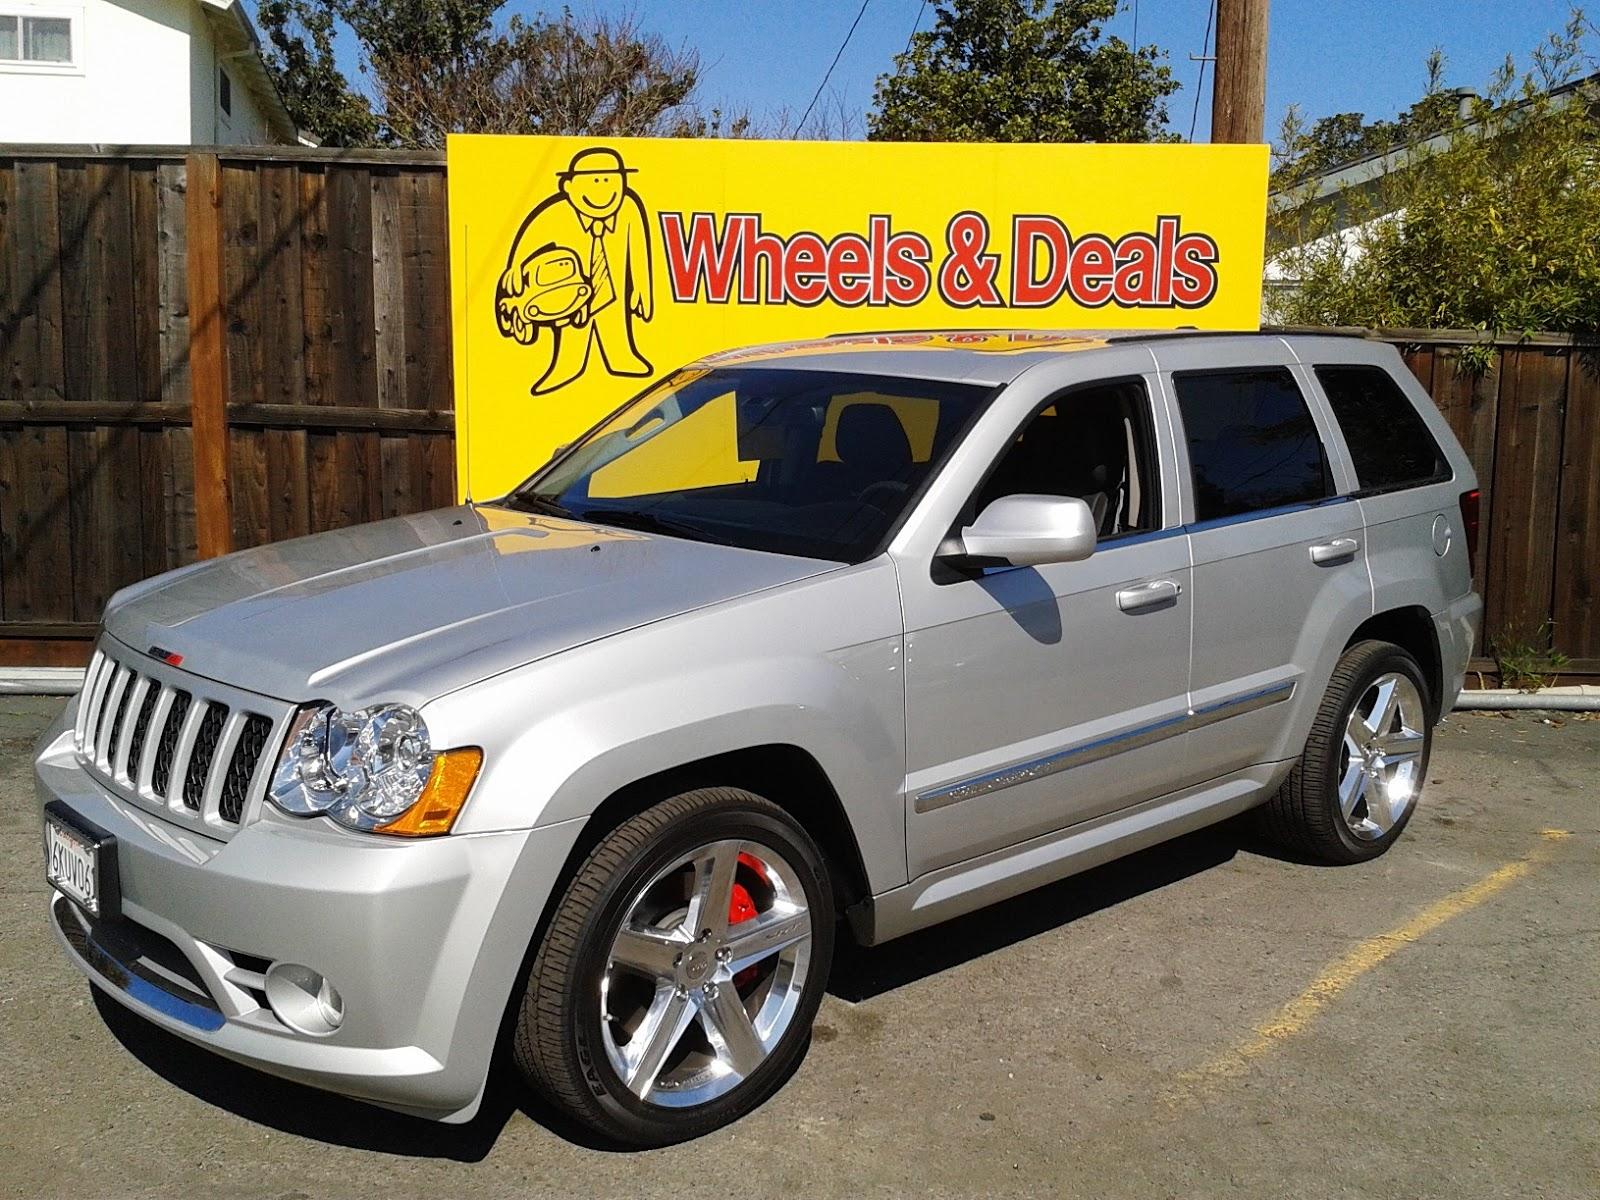 Wheels & Deals, Where Buyer Meets Seller: 2010 Jeep Grand Cherokee ...